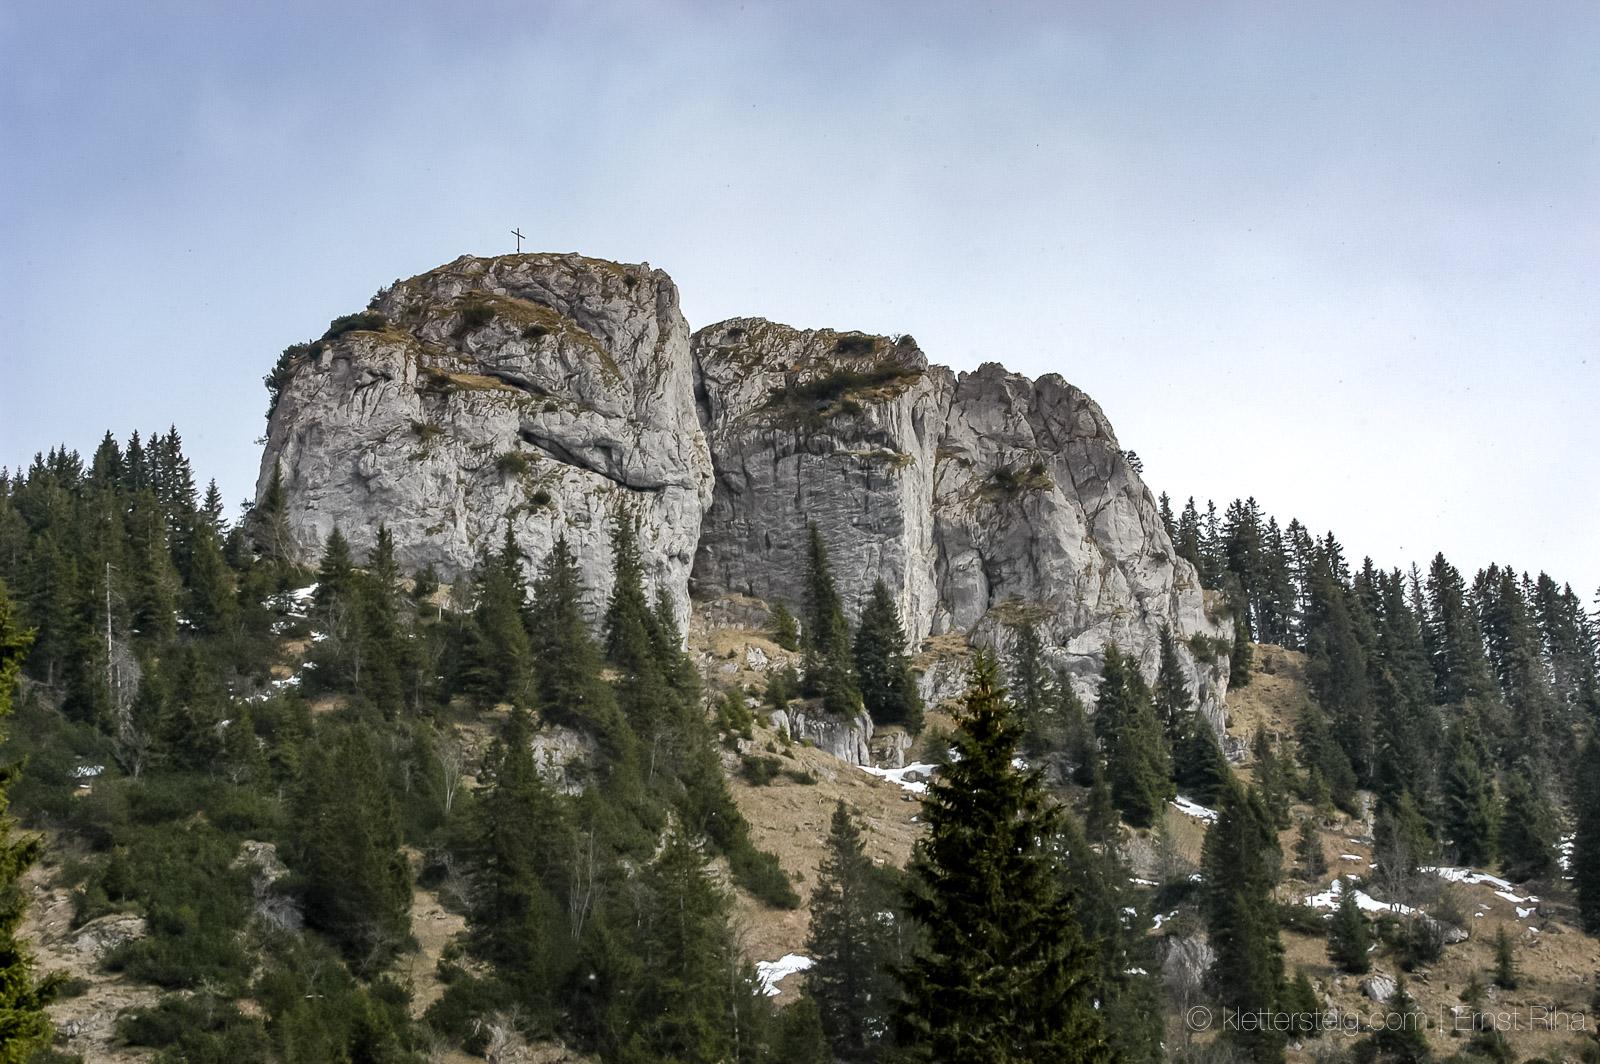 Klettersteig Am Ettaler Mandl : Ettaler manndl klettersteige